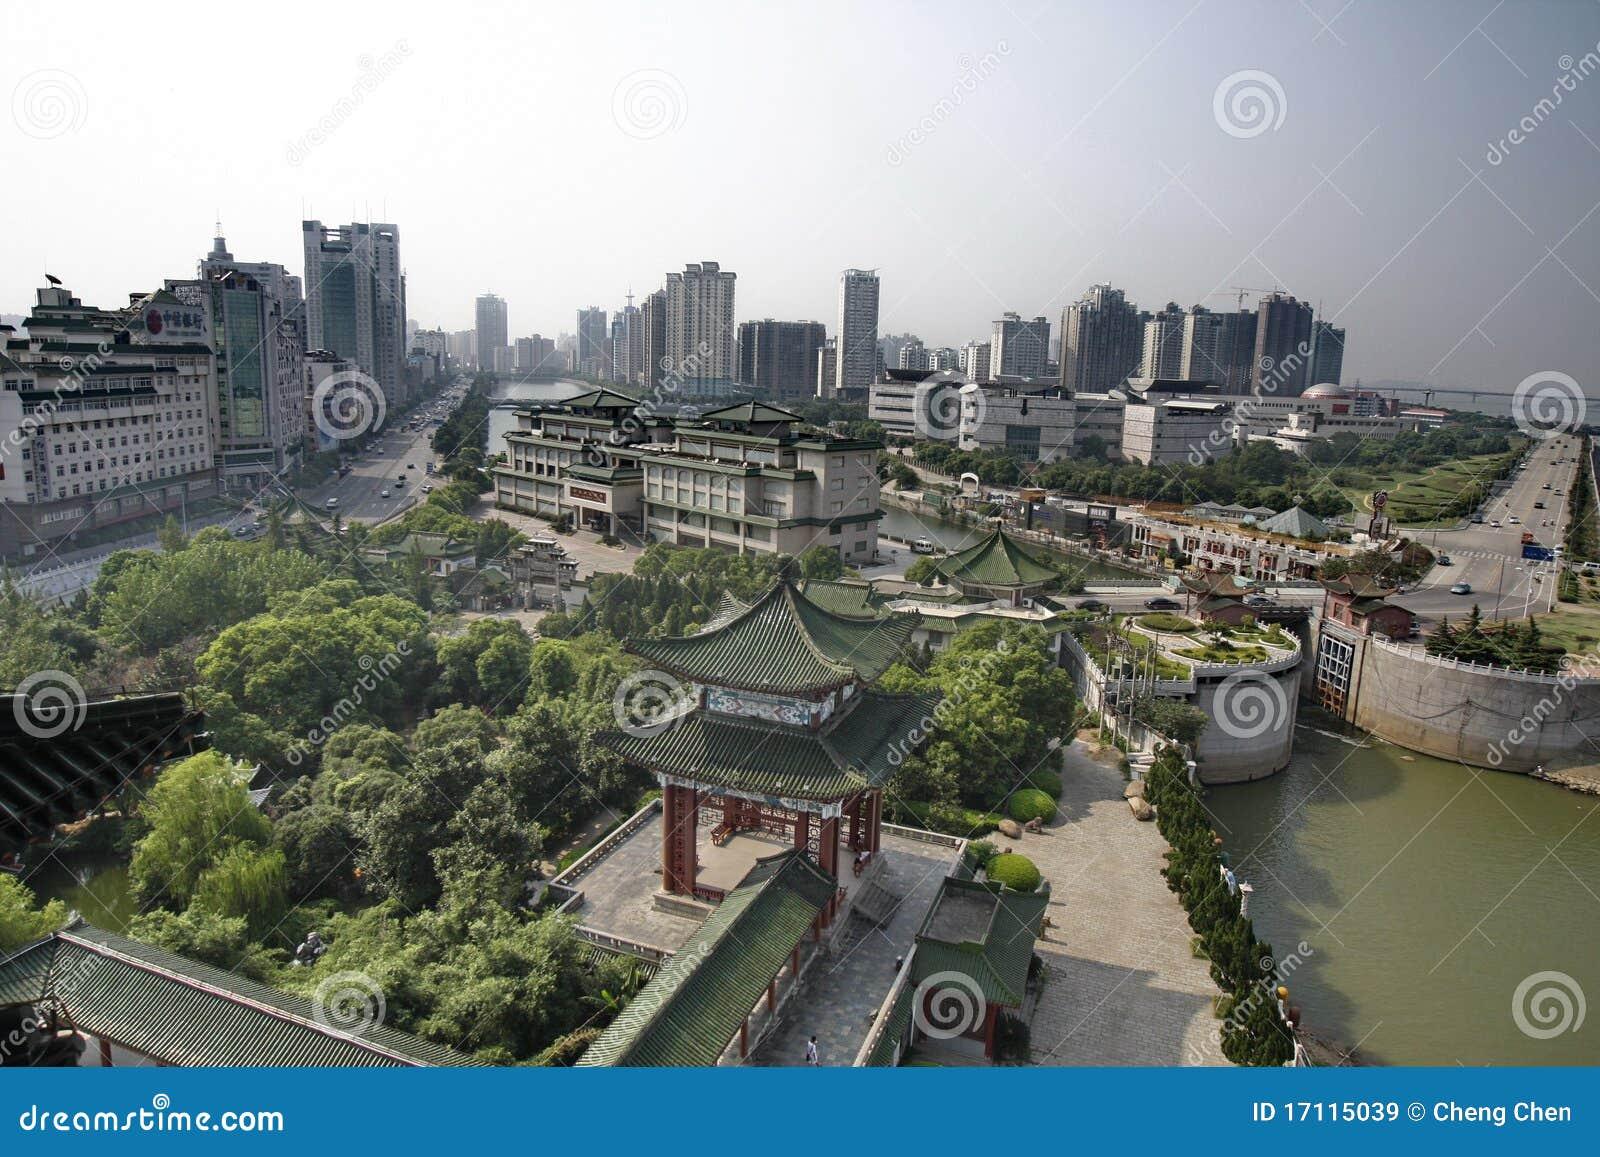 Nanchang | SkyriseCities